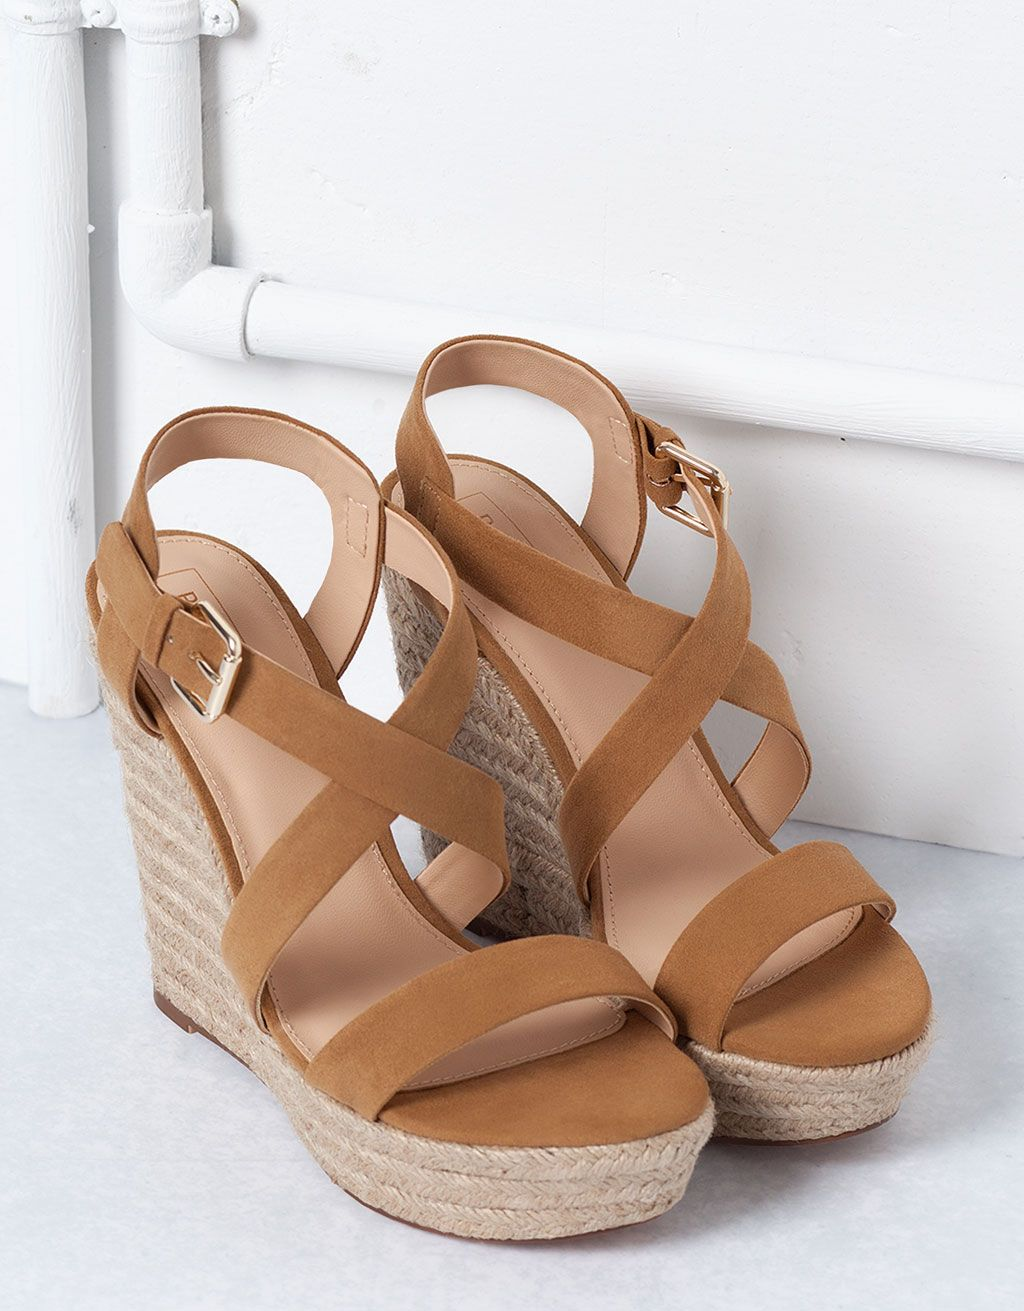 sandales compensées jute bershka - voir tout - bershka france